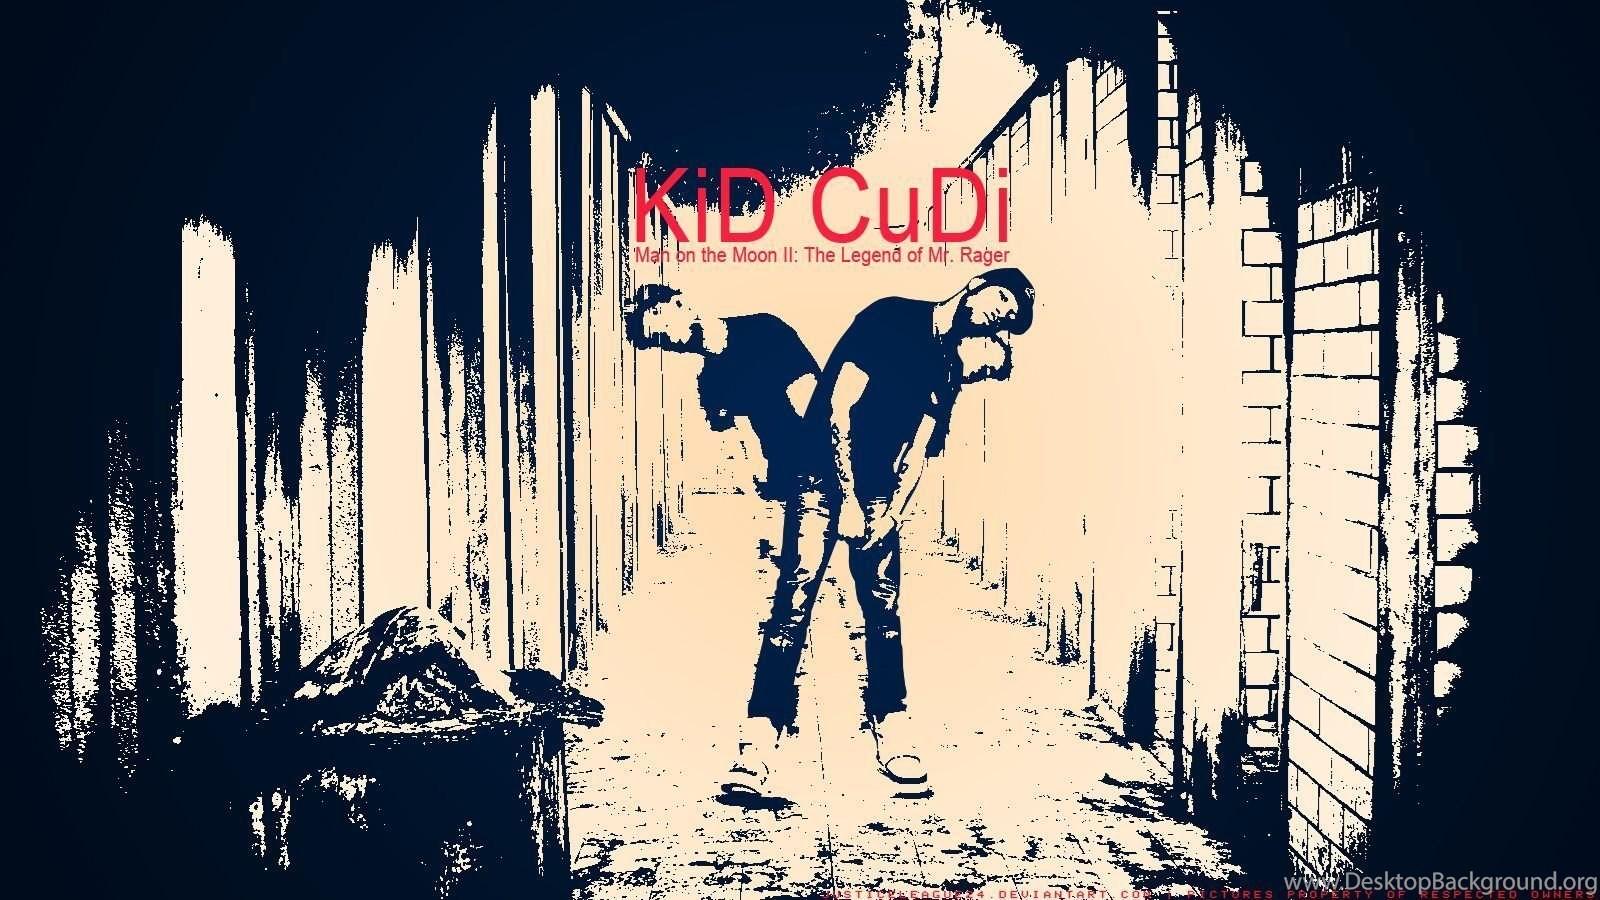 Kid Cudi Quotes Cool Sojis Wallpapers Desktop Background